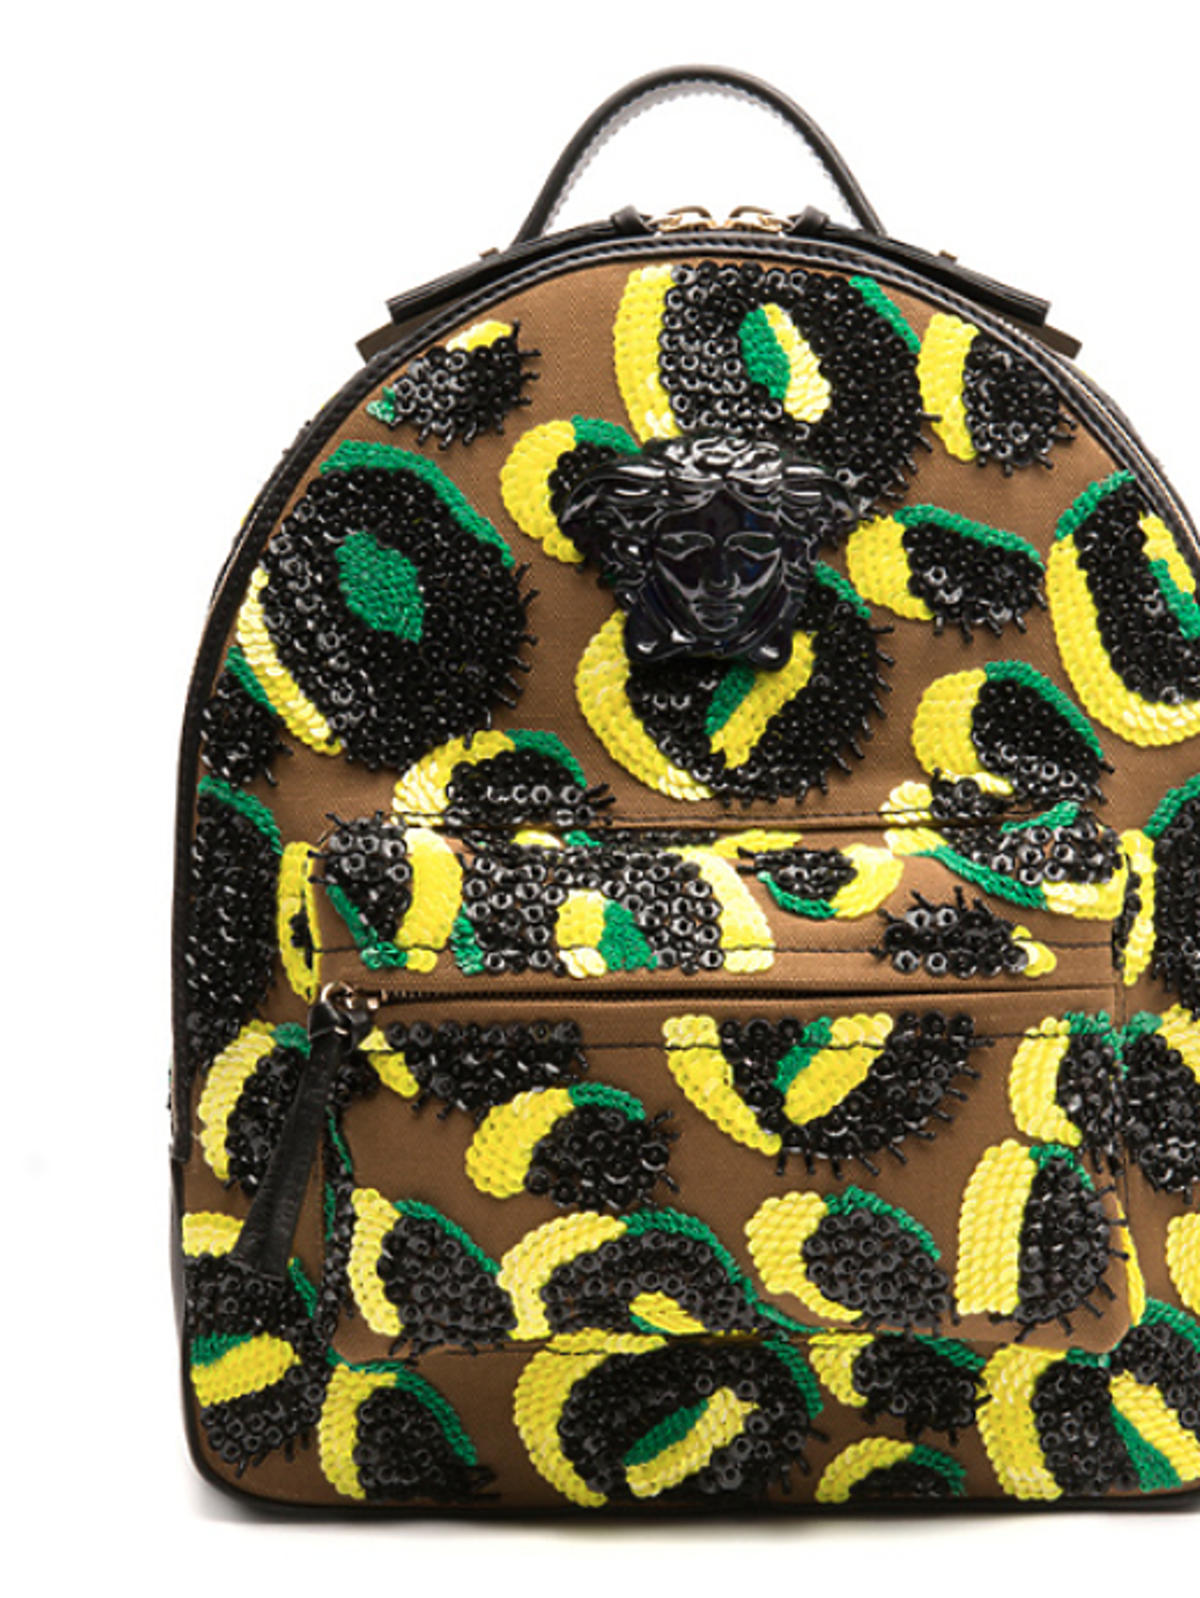 Plecak marki Versace, 11 108 zł